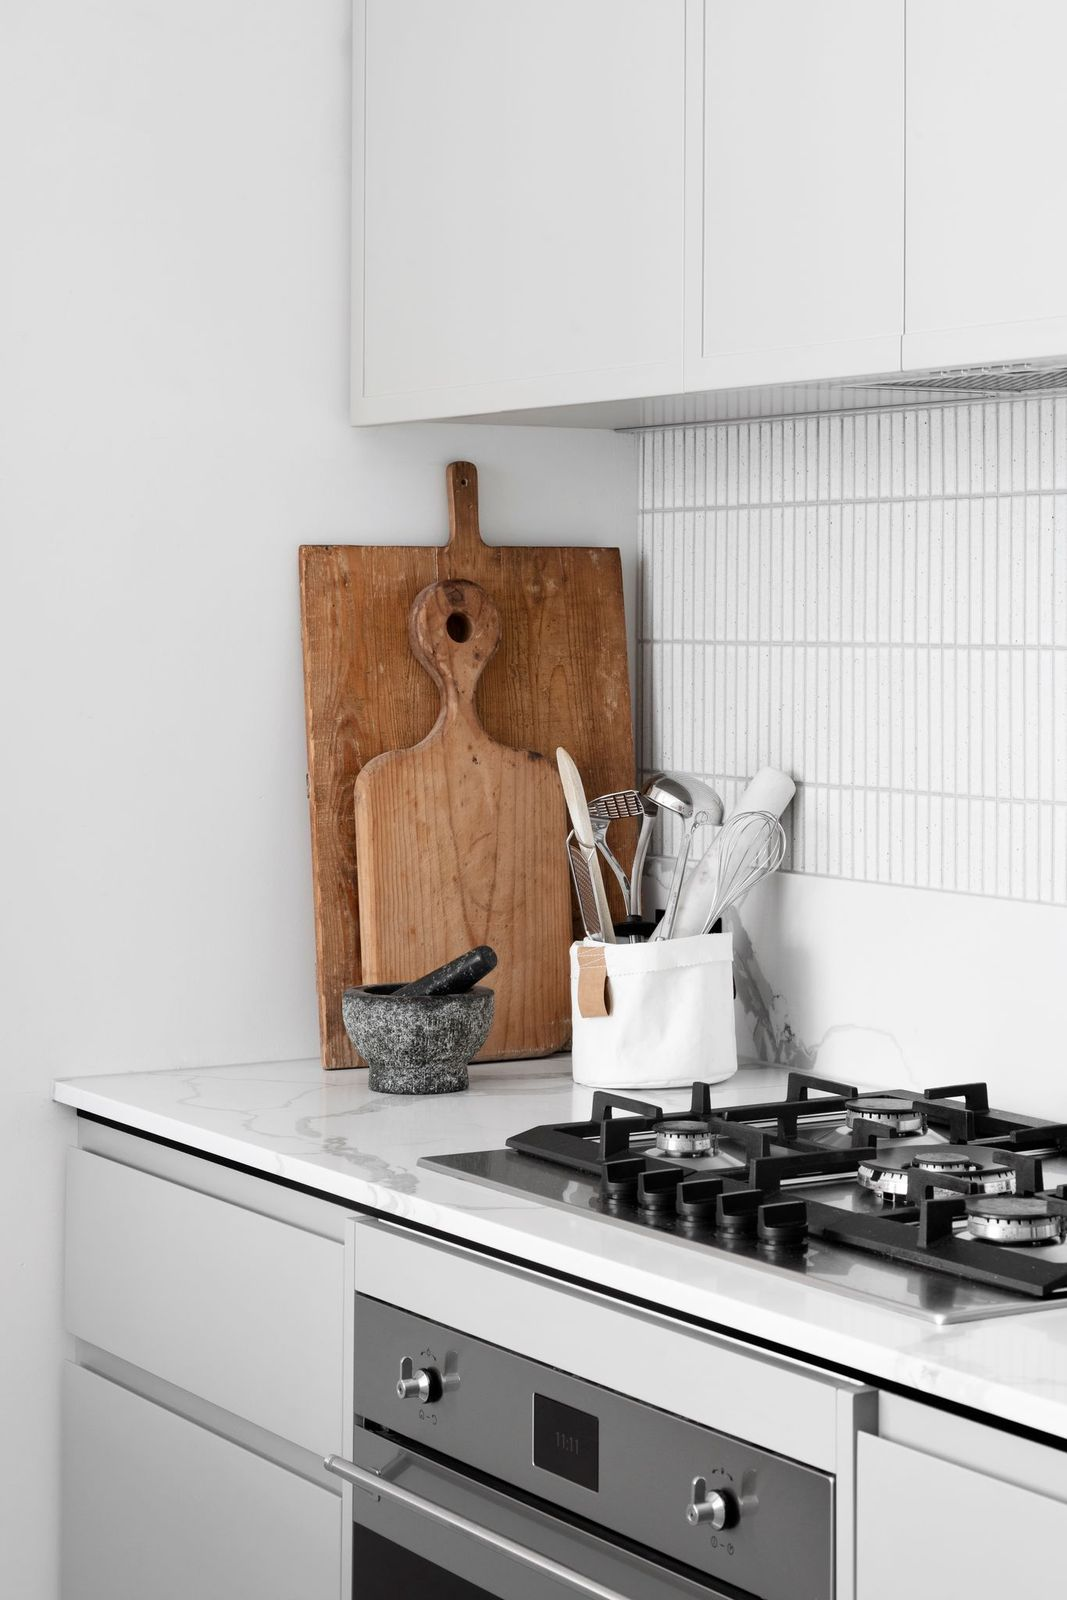 Wooden chopping board vignette in kitchen